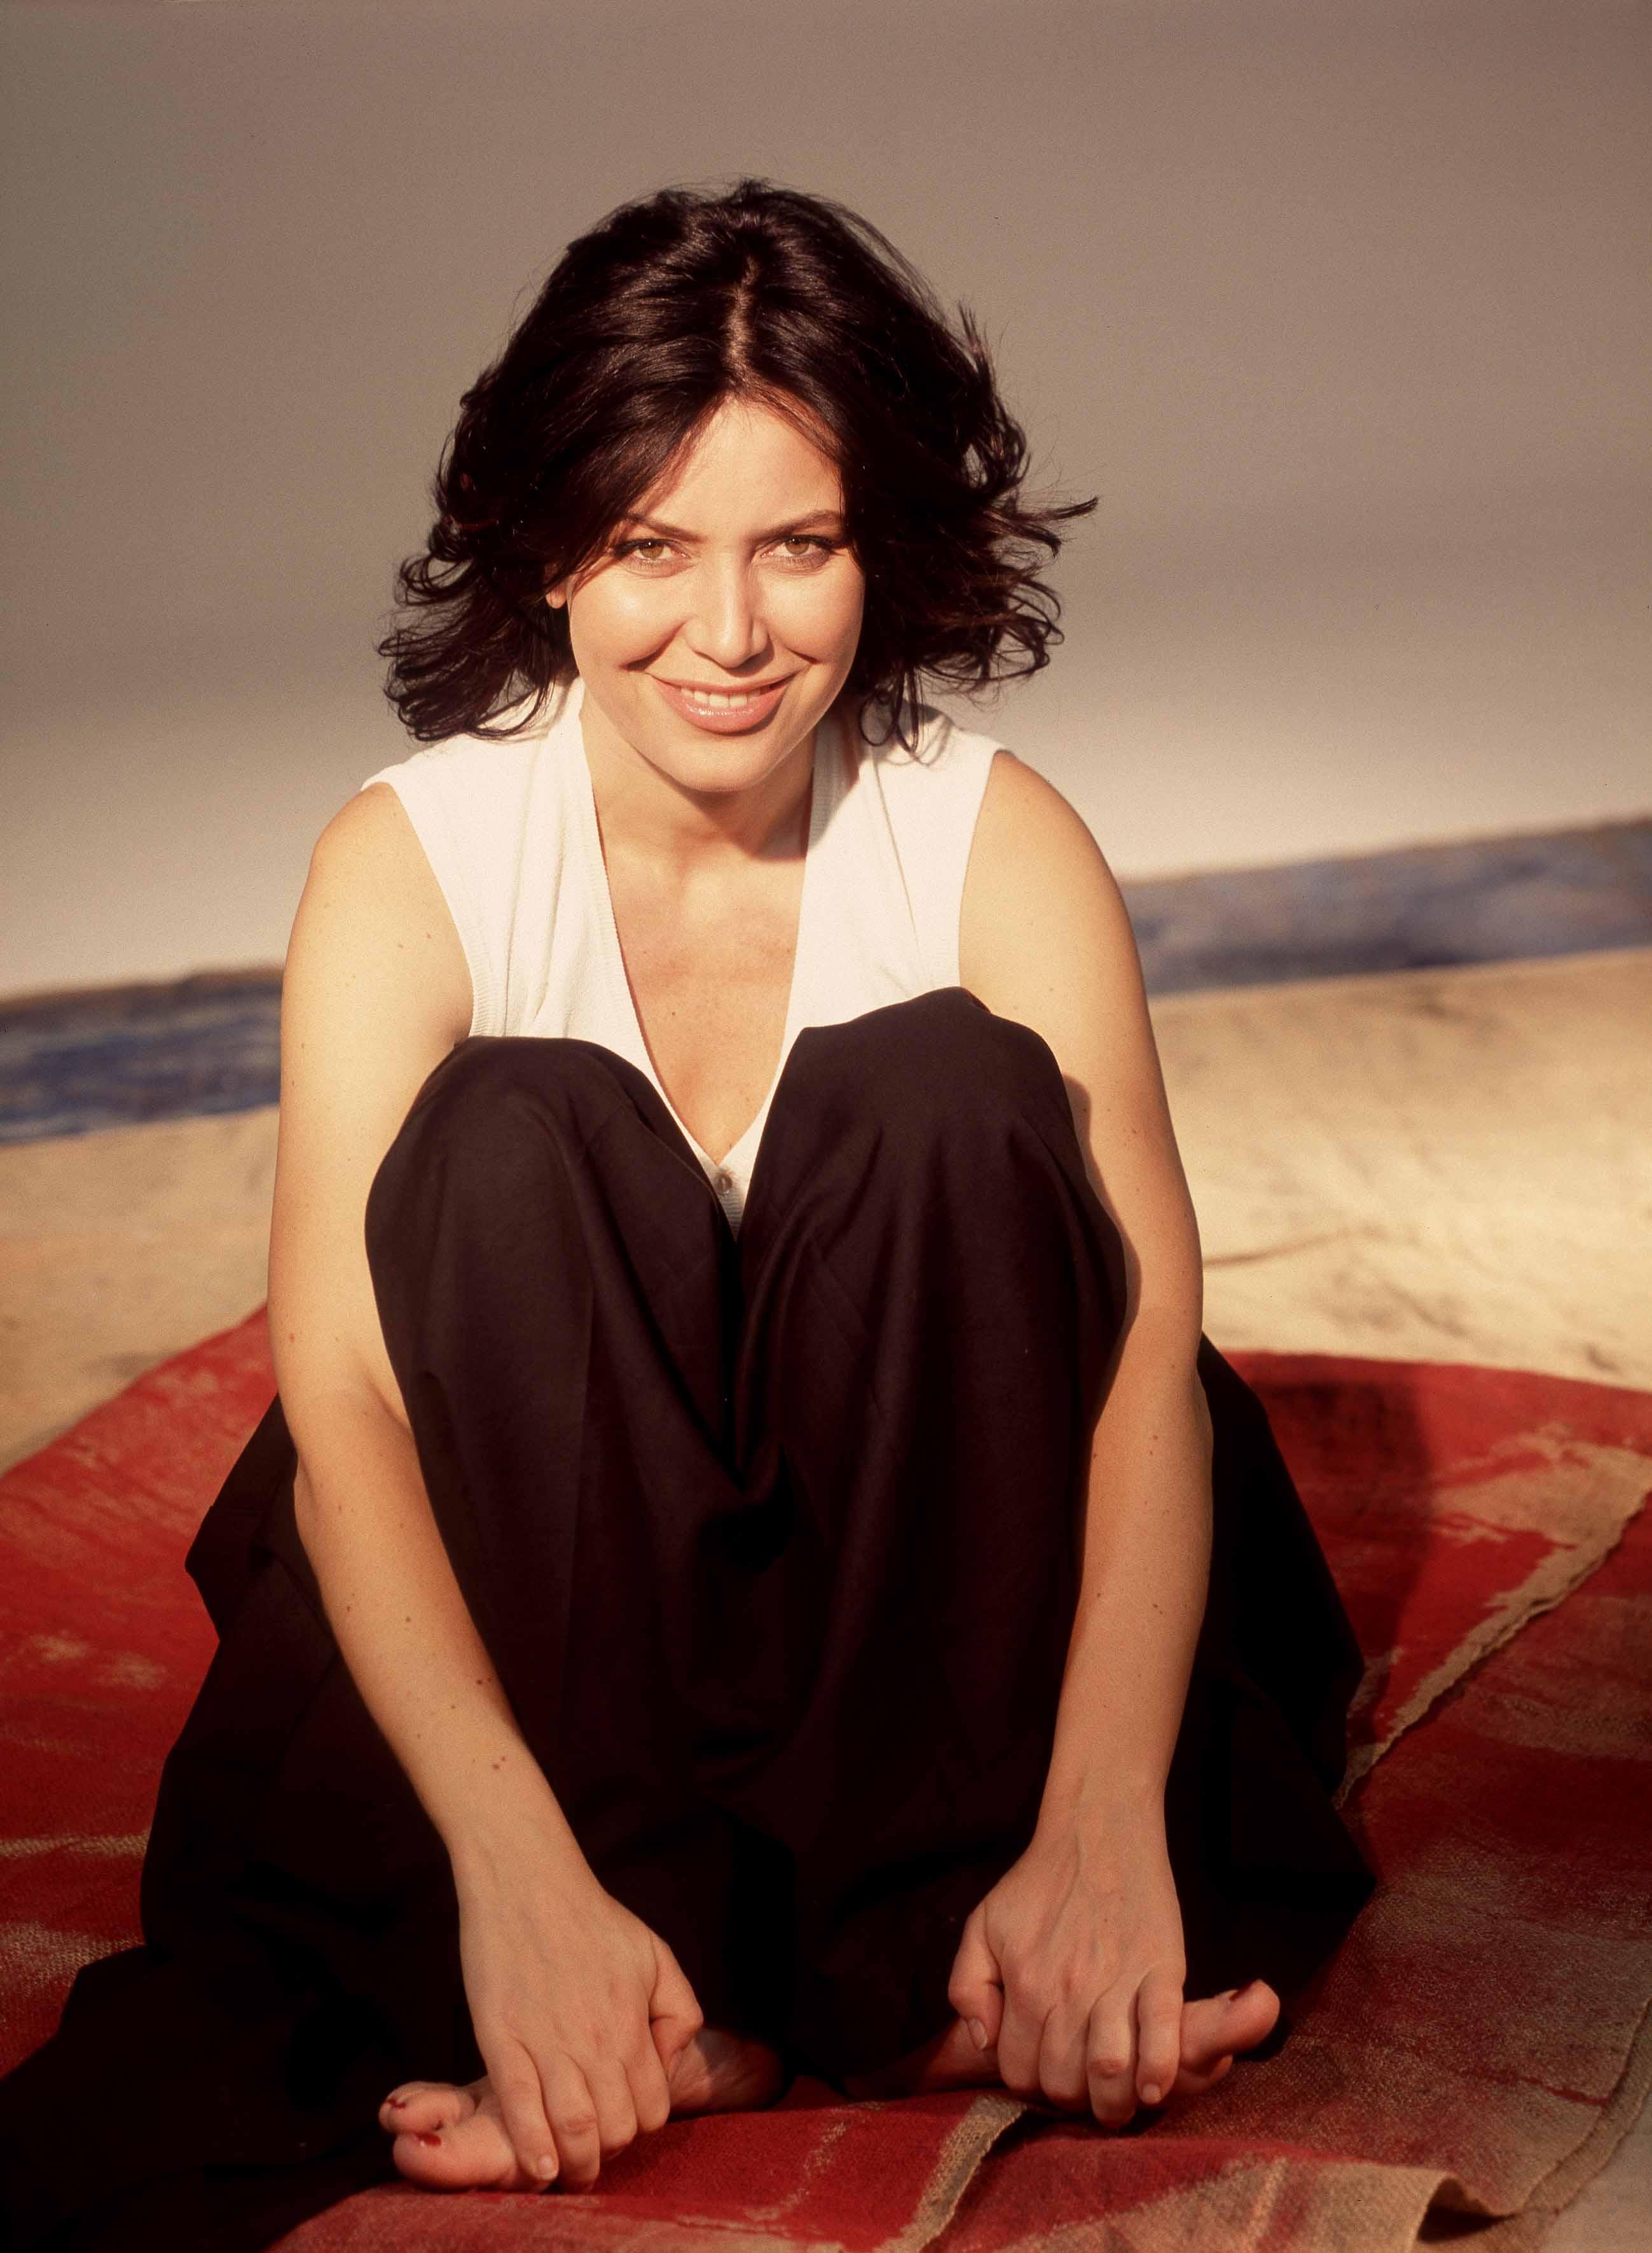 Sabina Guzzanti (born 1963) nude (19 foto and video), Pussy, Fappening, Feet, cameltoe 2015